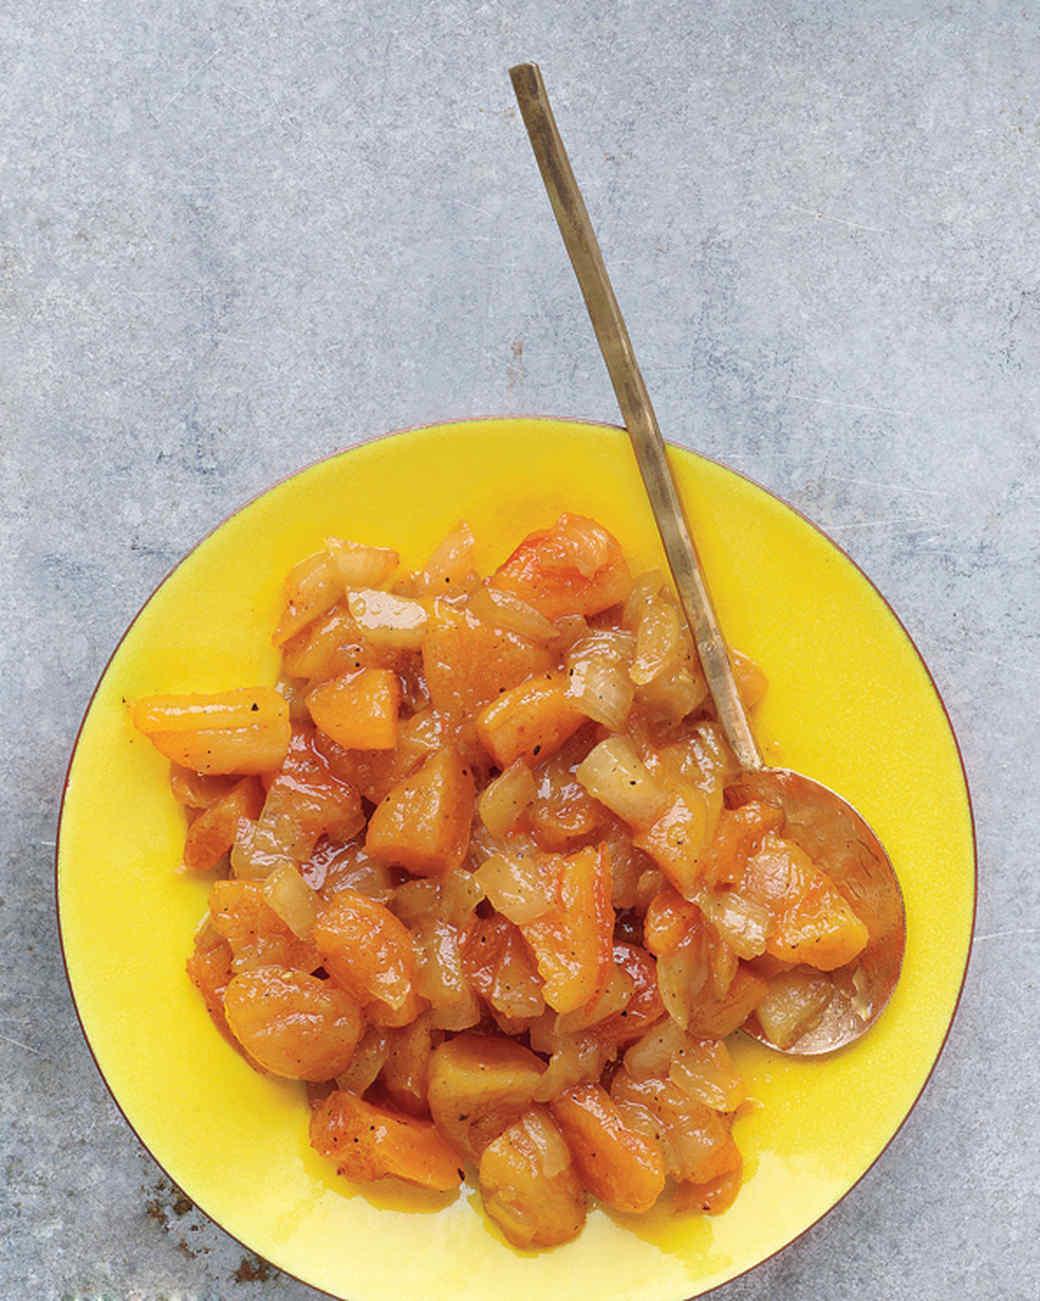 Apricot-Orange Chutney